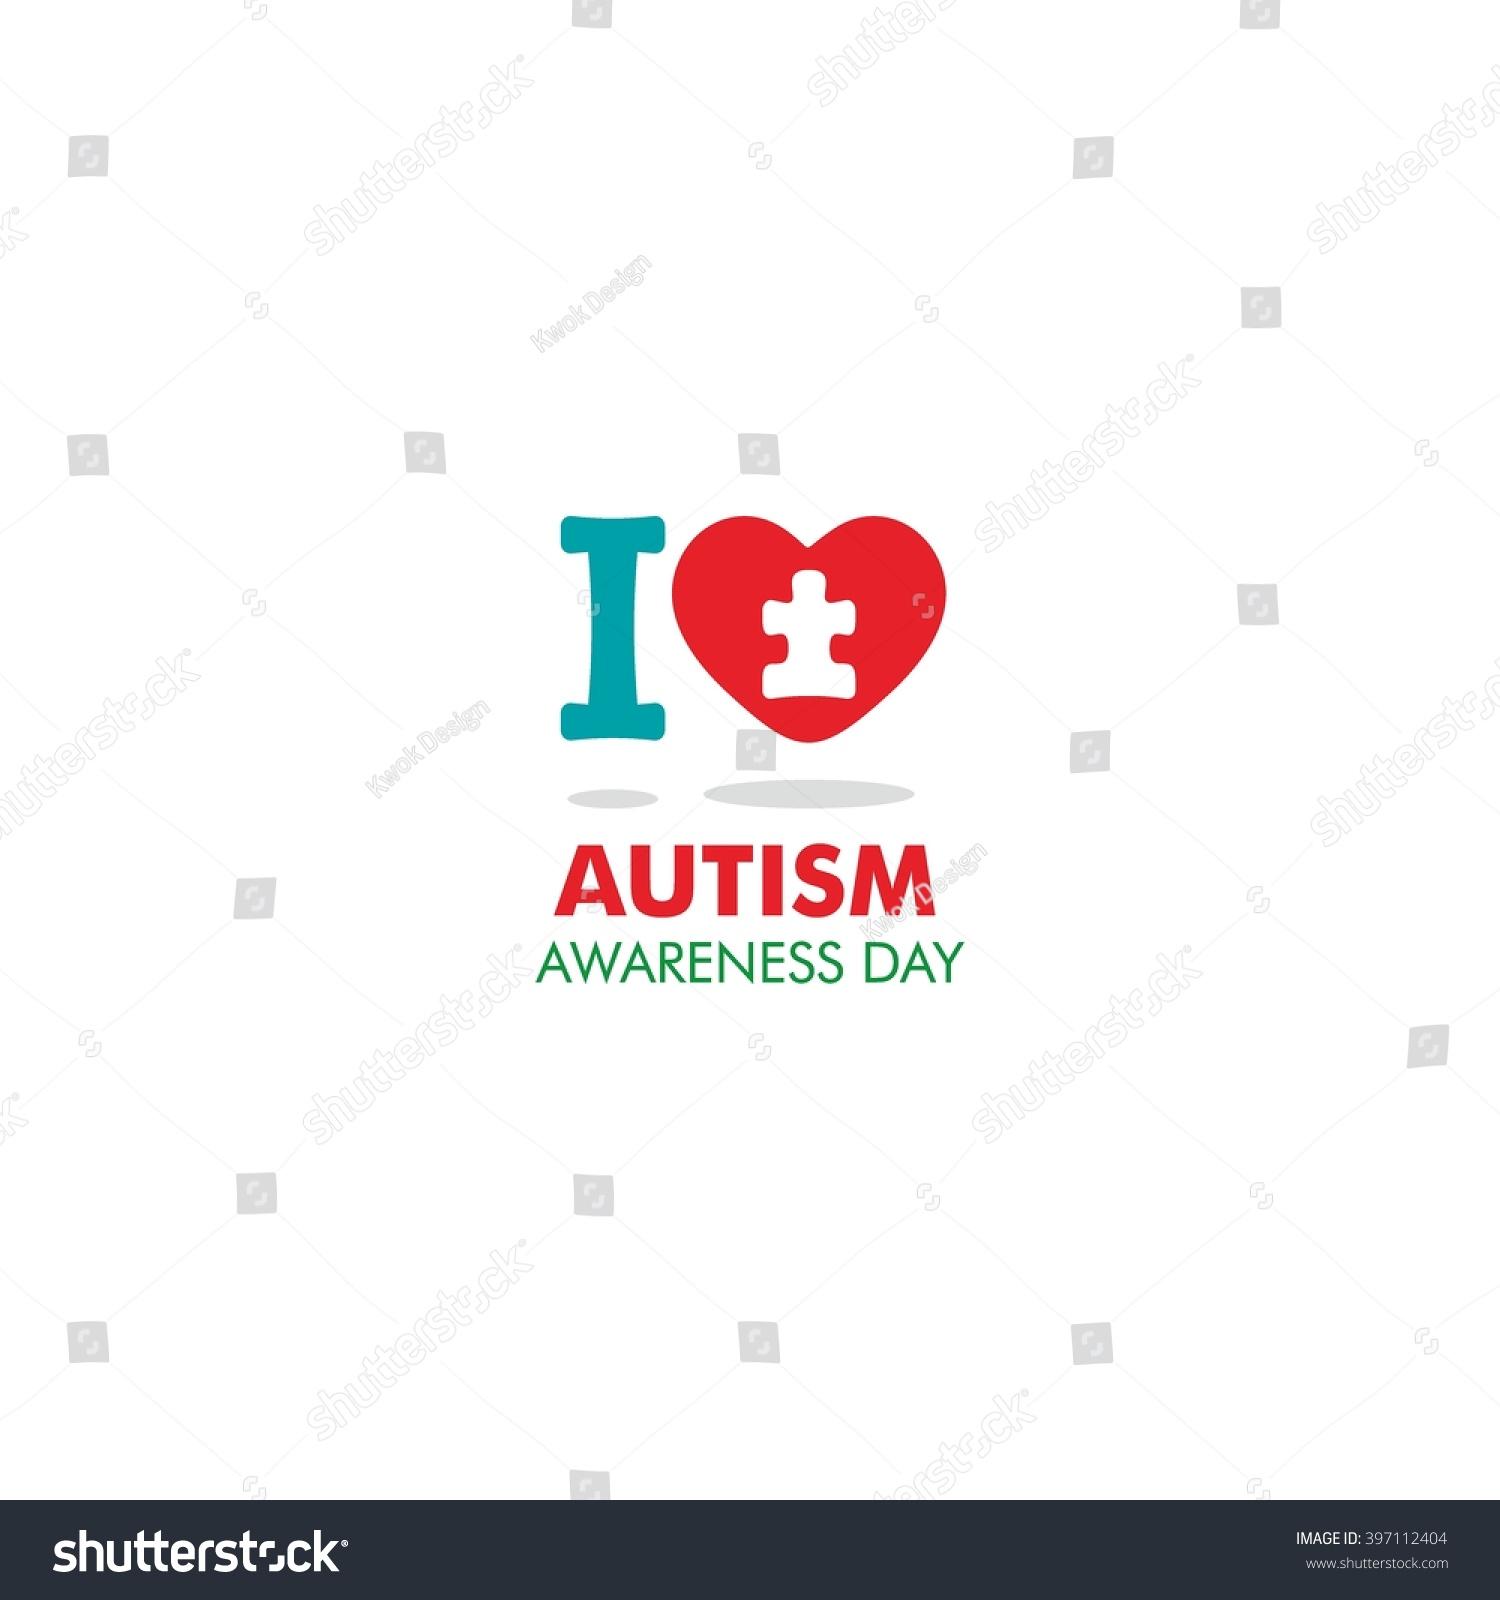 World autism awareness day logo design stock vector 397112404 world autism awareness day logo design template vector illustration colorful puzzles symbol biocorpaavc